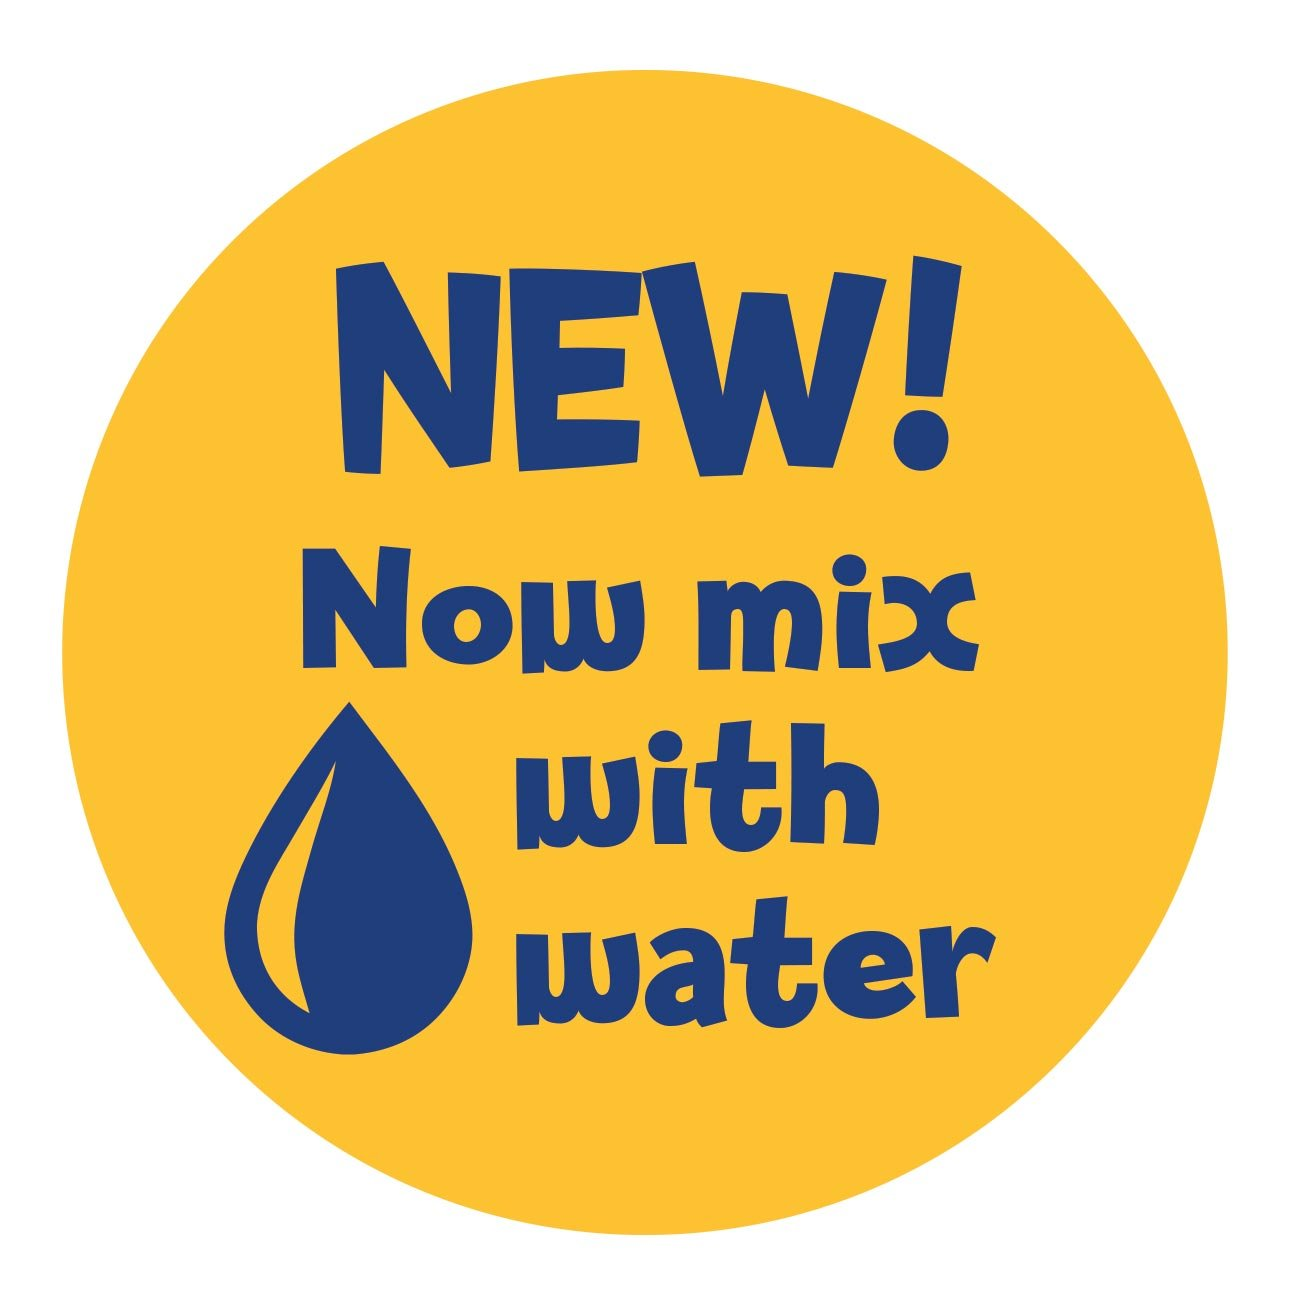 PediaSure Grow & Gain Non-GMO Vanilla Shake Mix Powder, Nutrition Shake for Kids, 14.1 oz, 3 Count by Pediasure (Image #7)